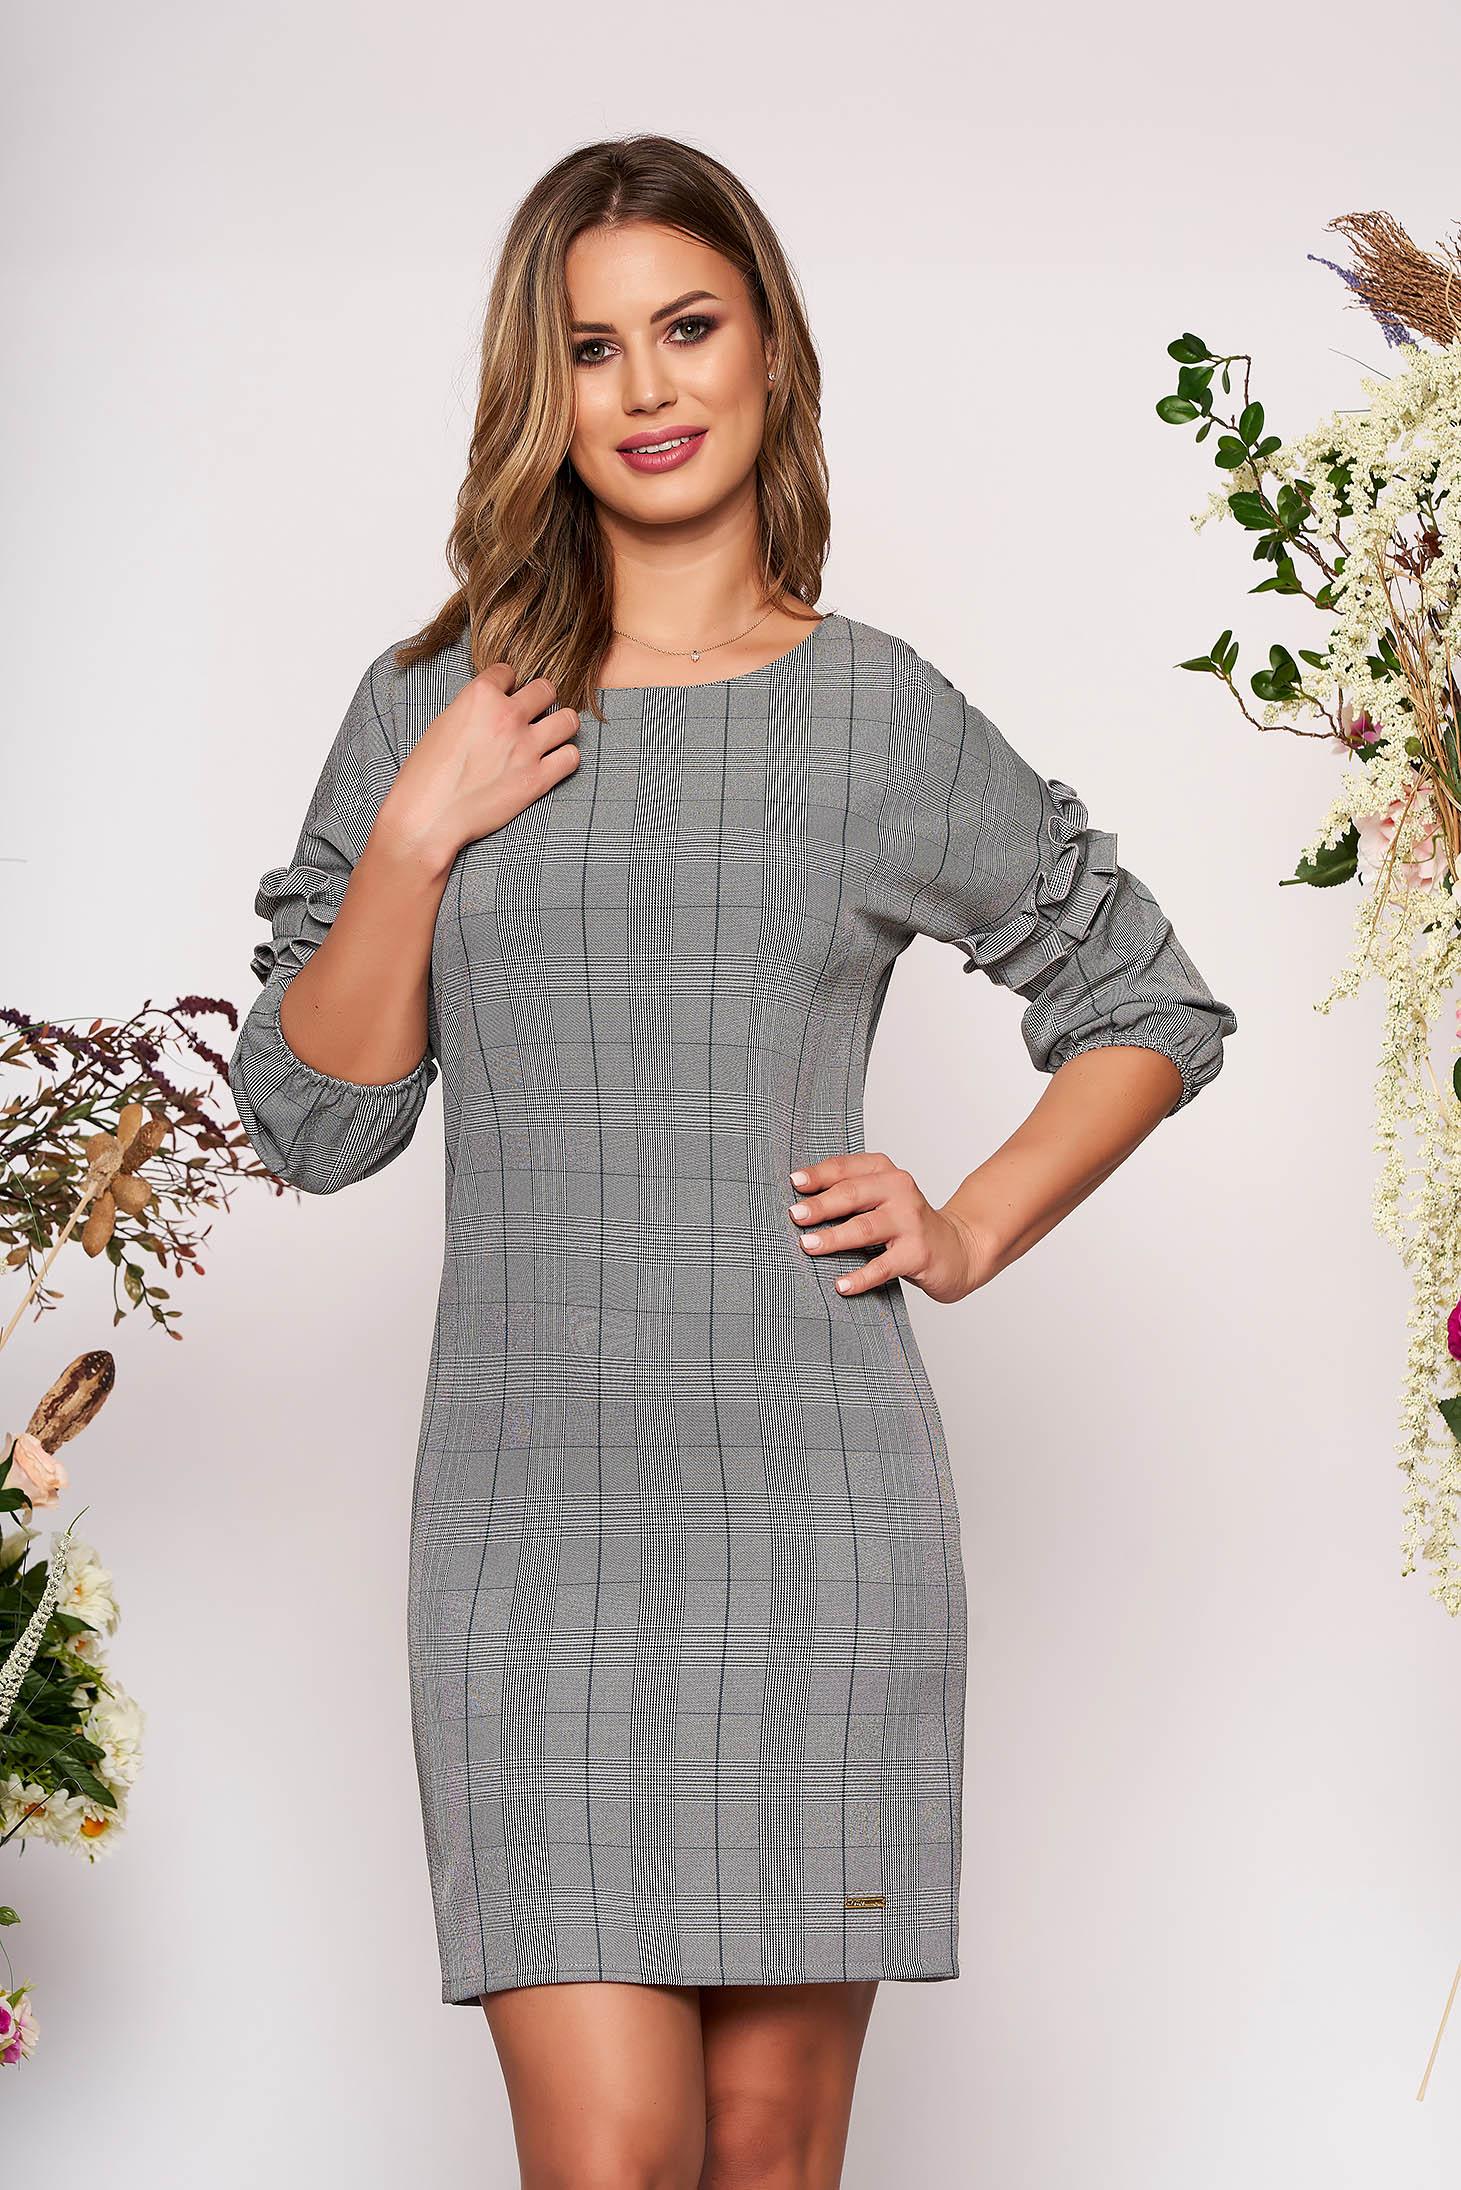 Rochie gri-inchis scurta eleganta cu un croi drept din stofa in carouri cu volanase la maneca